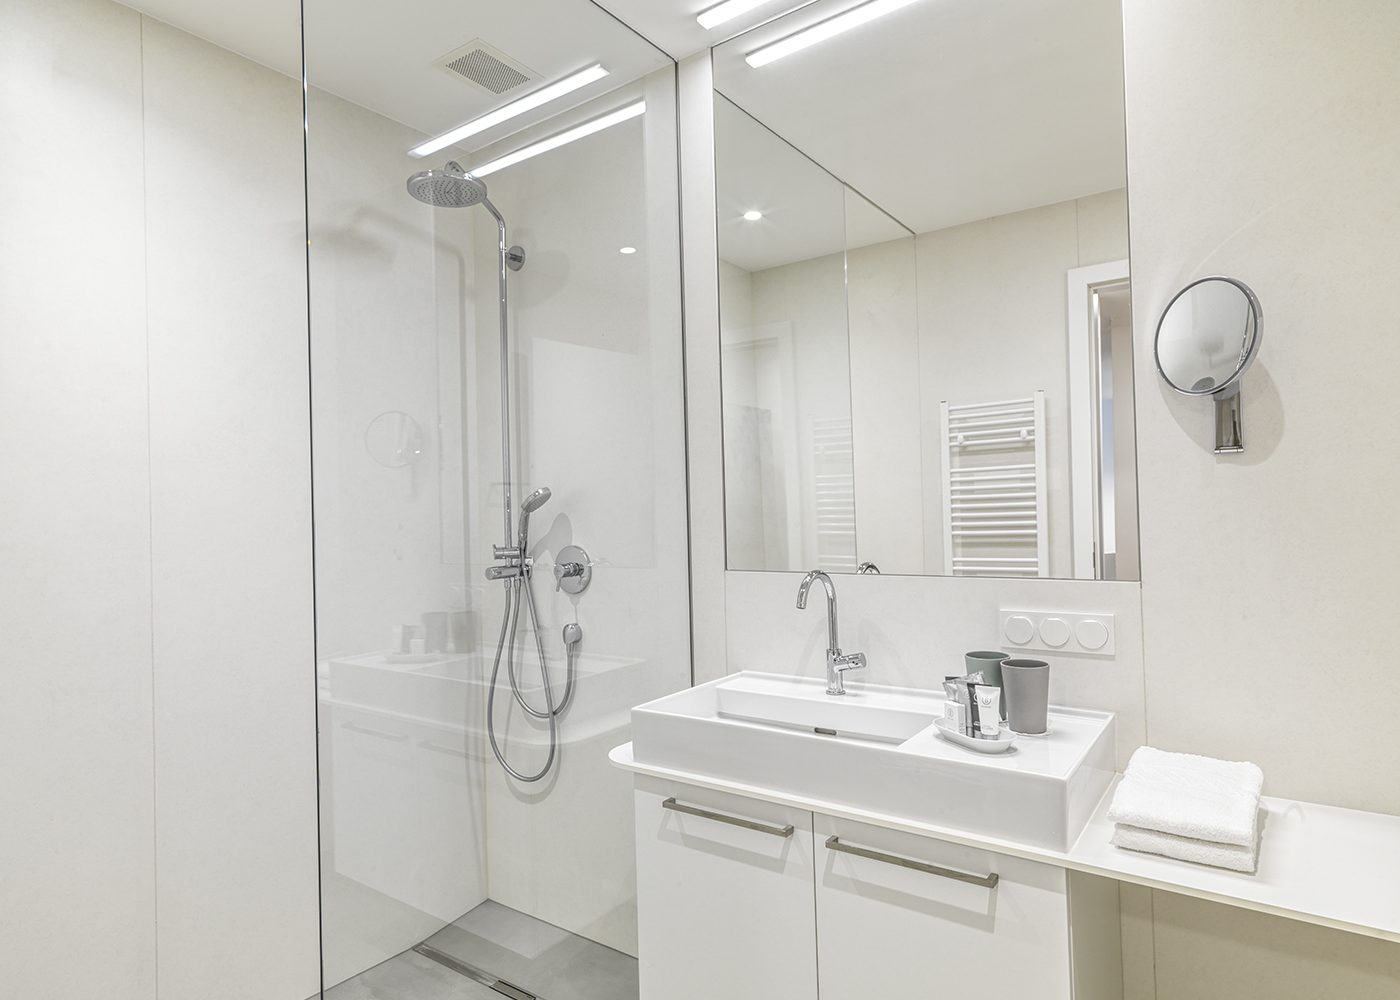 Interior bathroom - shower and sink